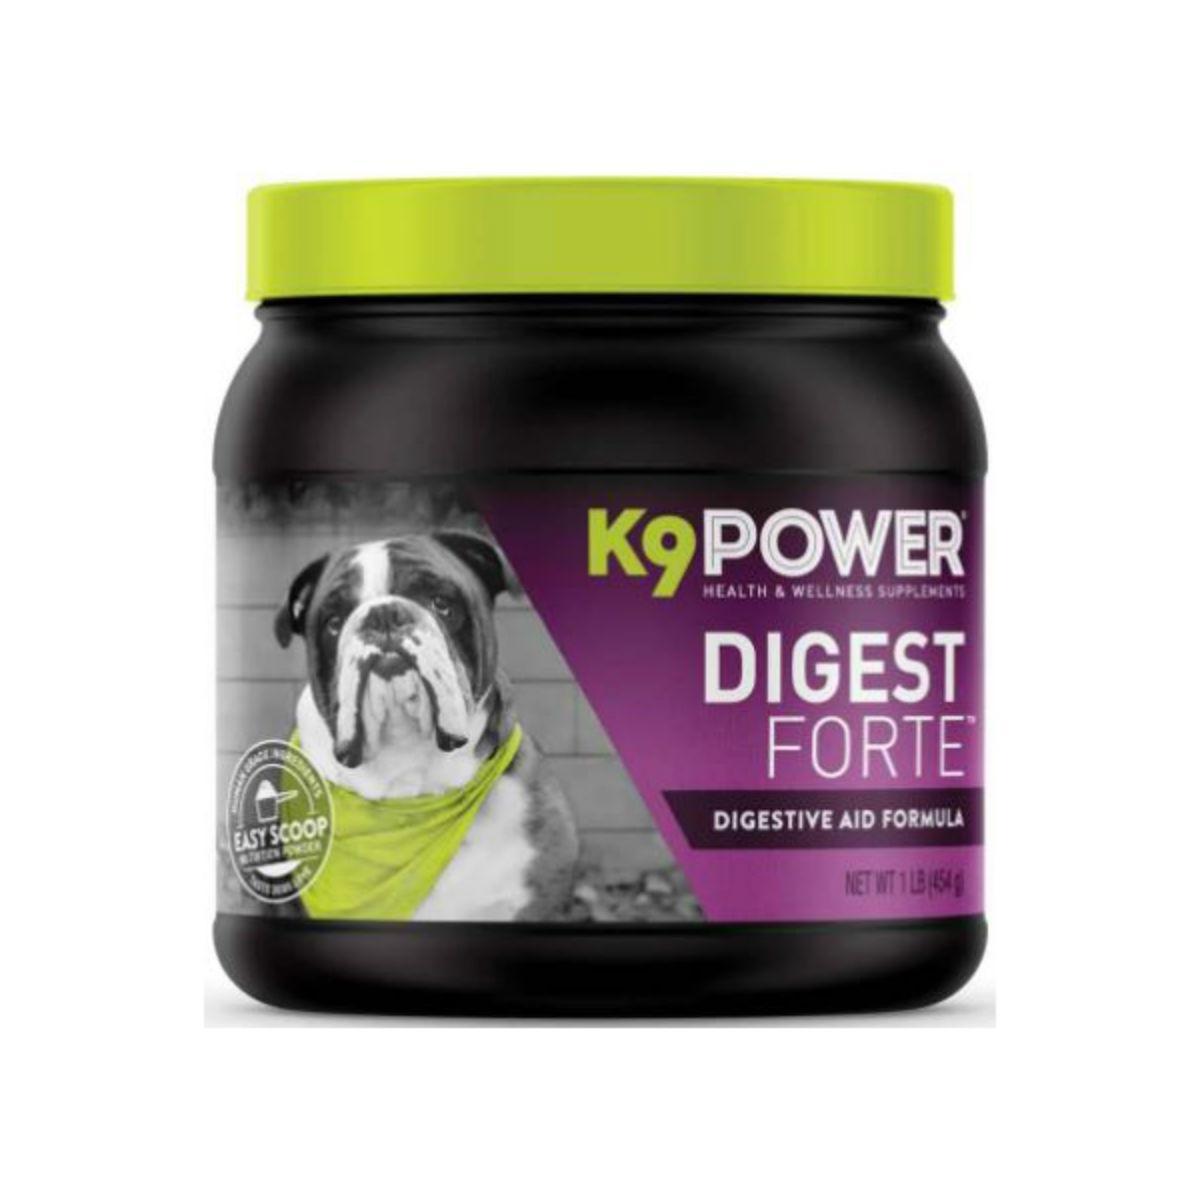 K9 Power Digest Forte Digestive Aid Dog Supplement